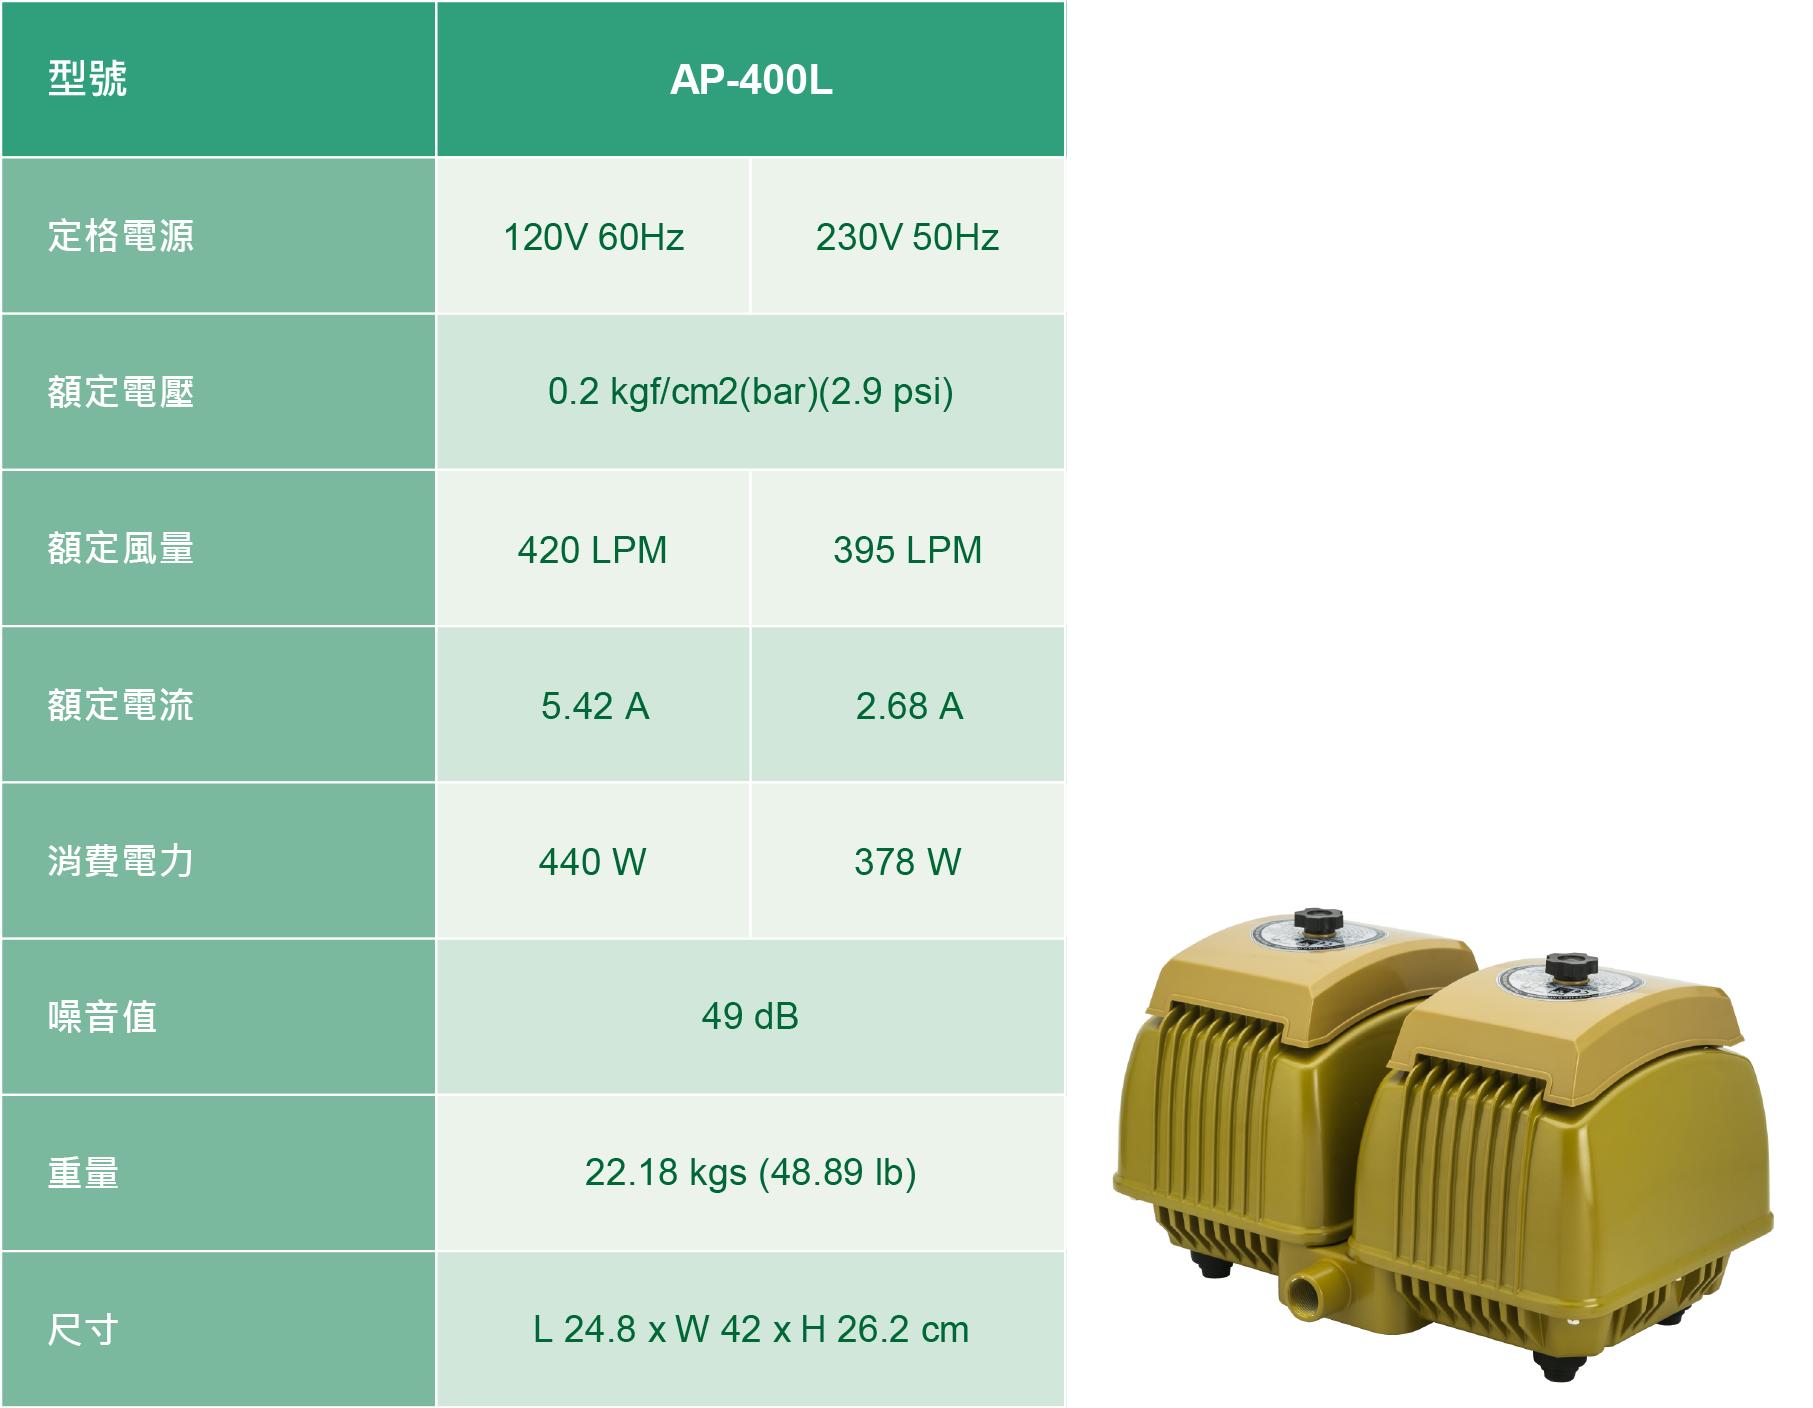 Linear Air Pumps AP-400L Performance